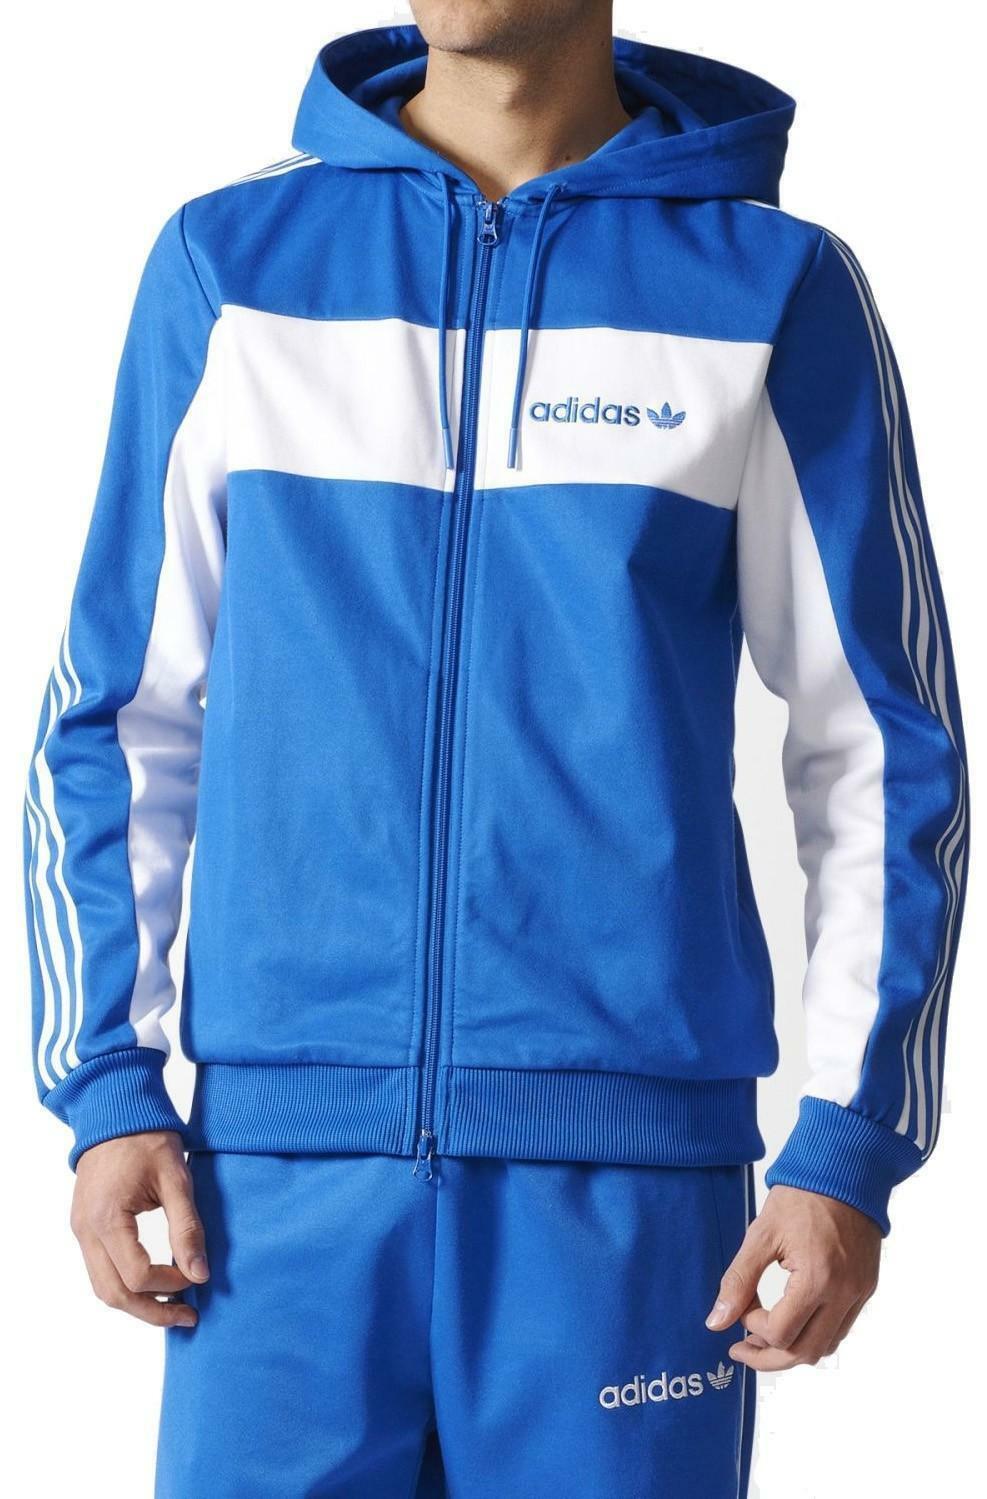 adidas originals adidas minoh hooded giacchetto uomo azzurro